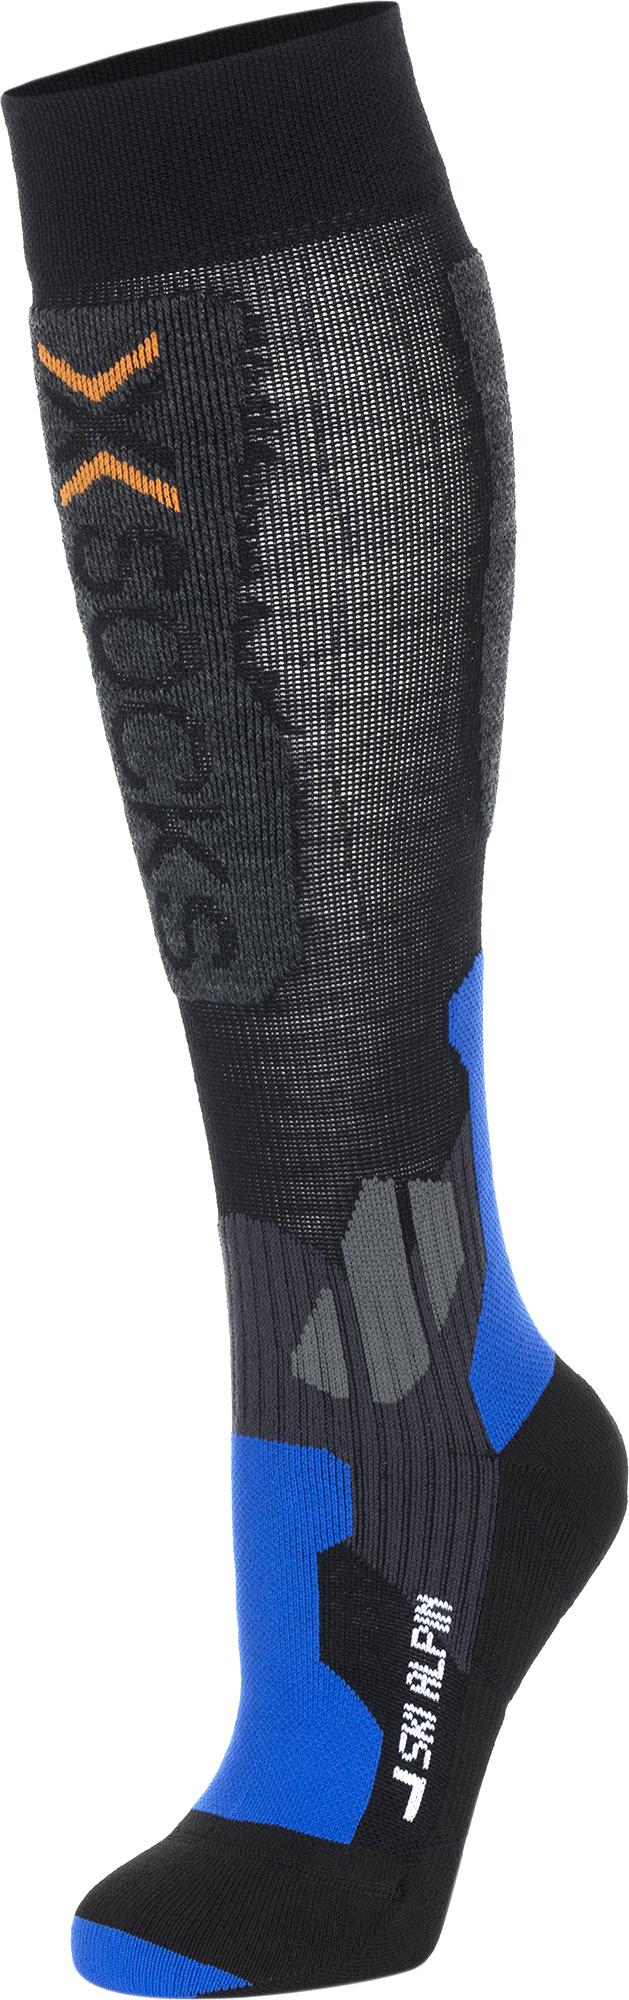 X-Socks Гольфы X-Socks Ski Alpin, 1 пара насос sks x alpin 10035sks